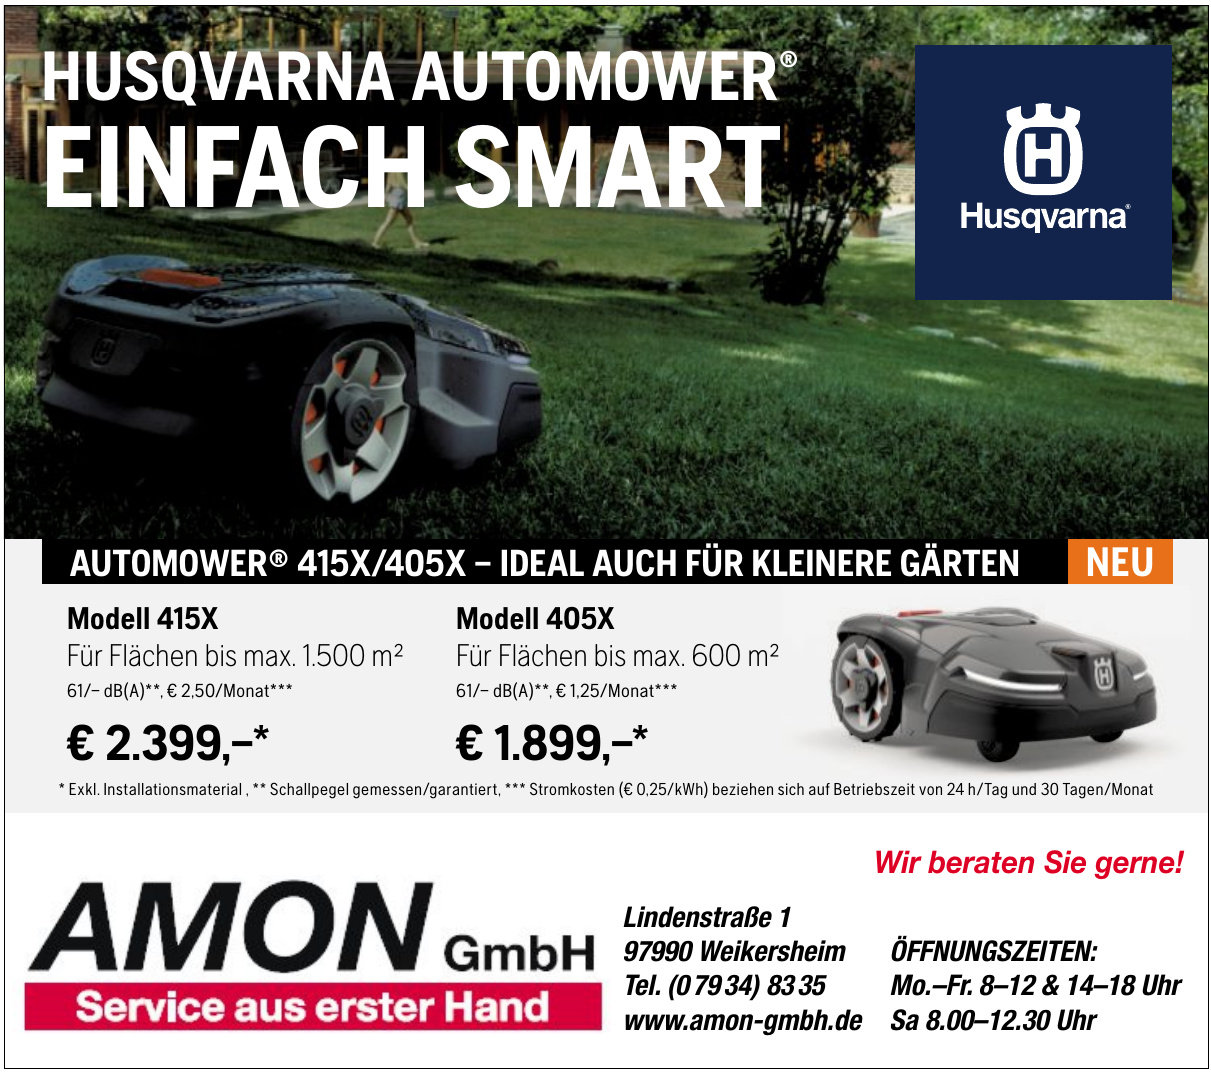 Amon GmbH